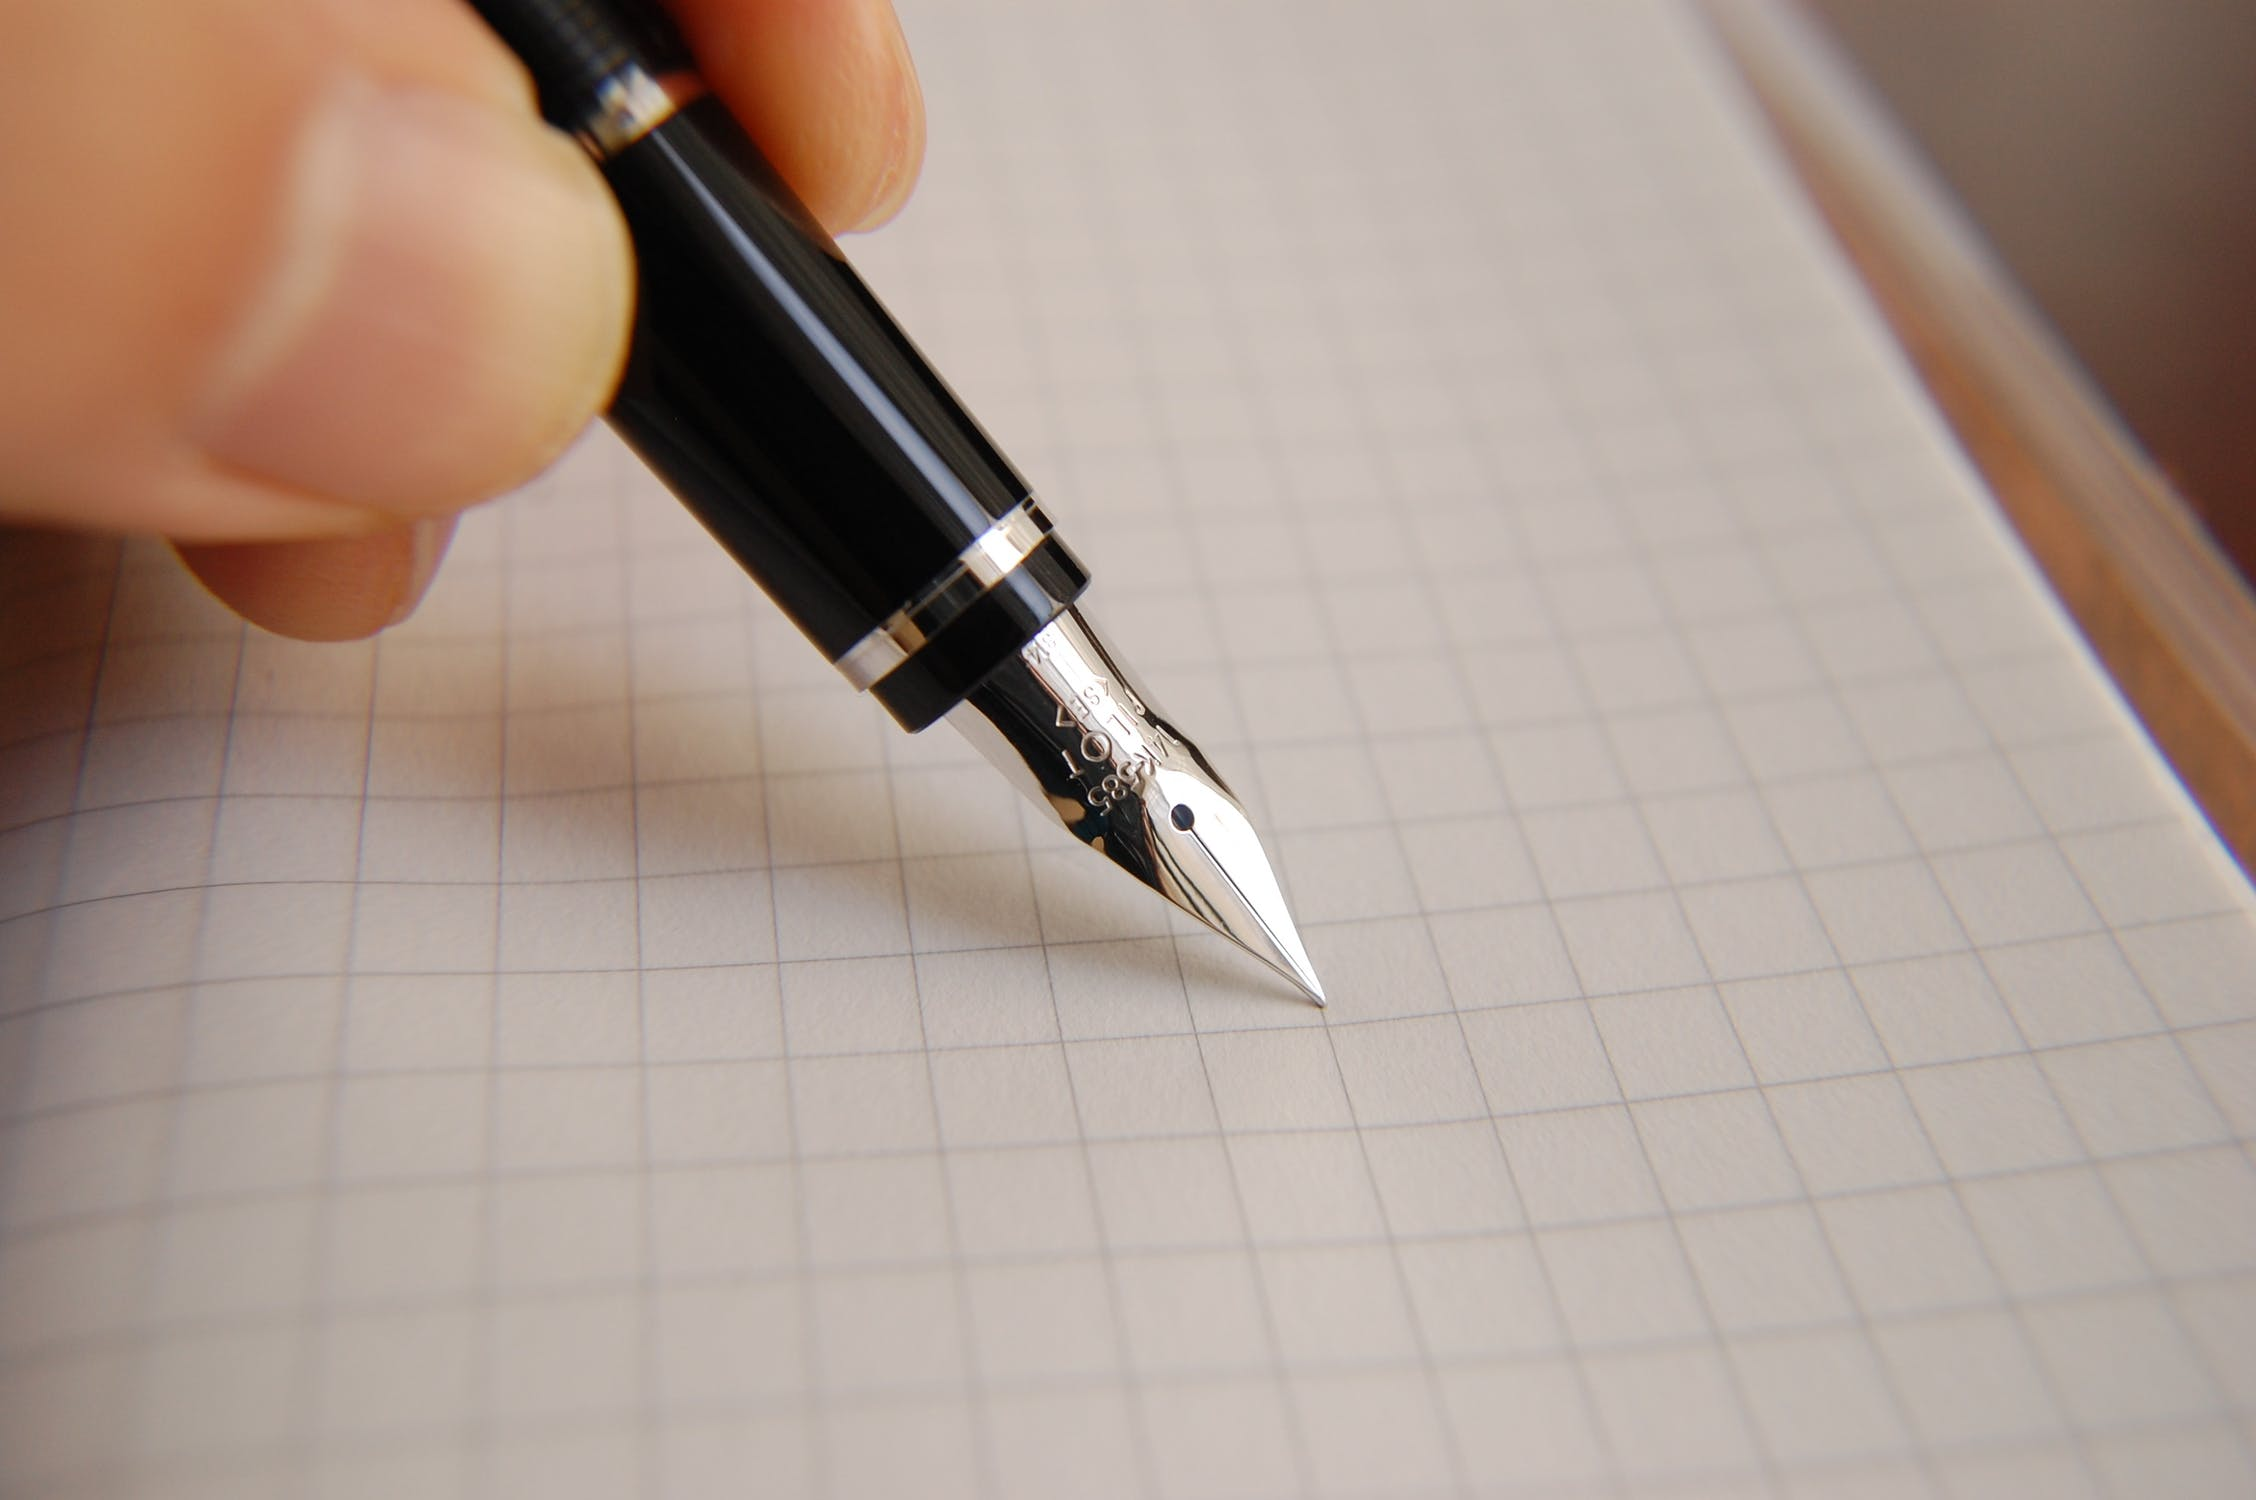 pasos y documentos para heredar